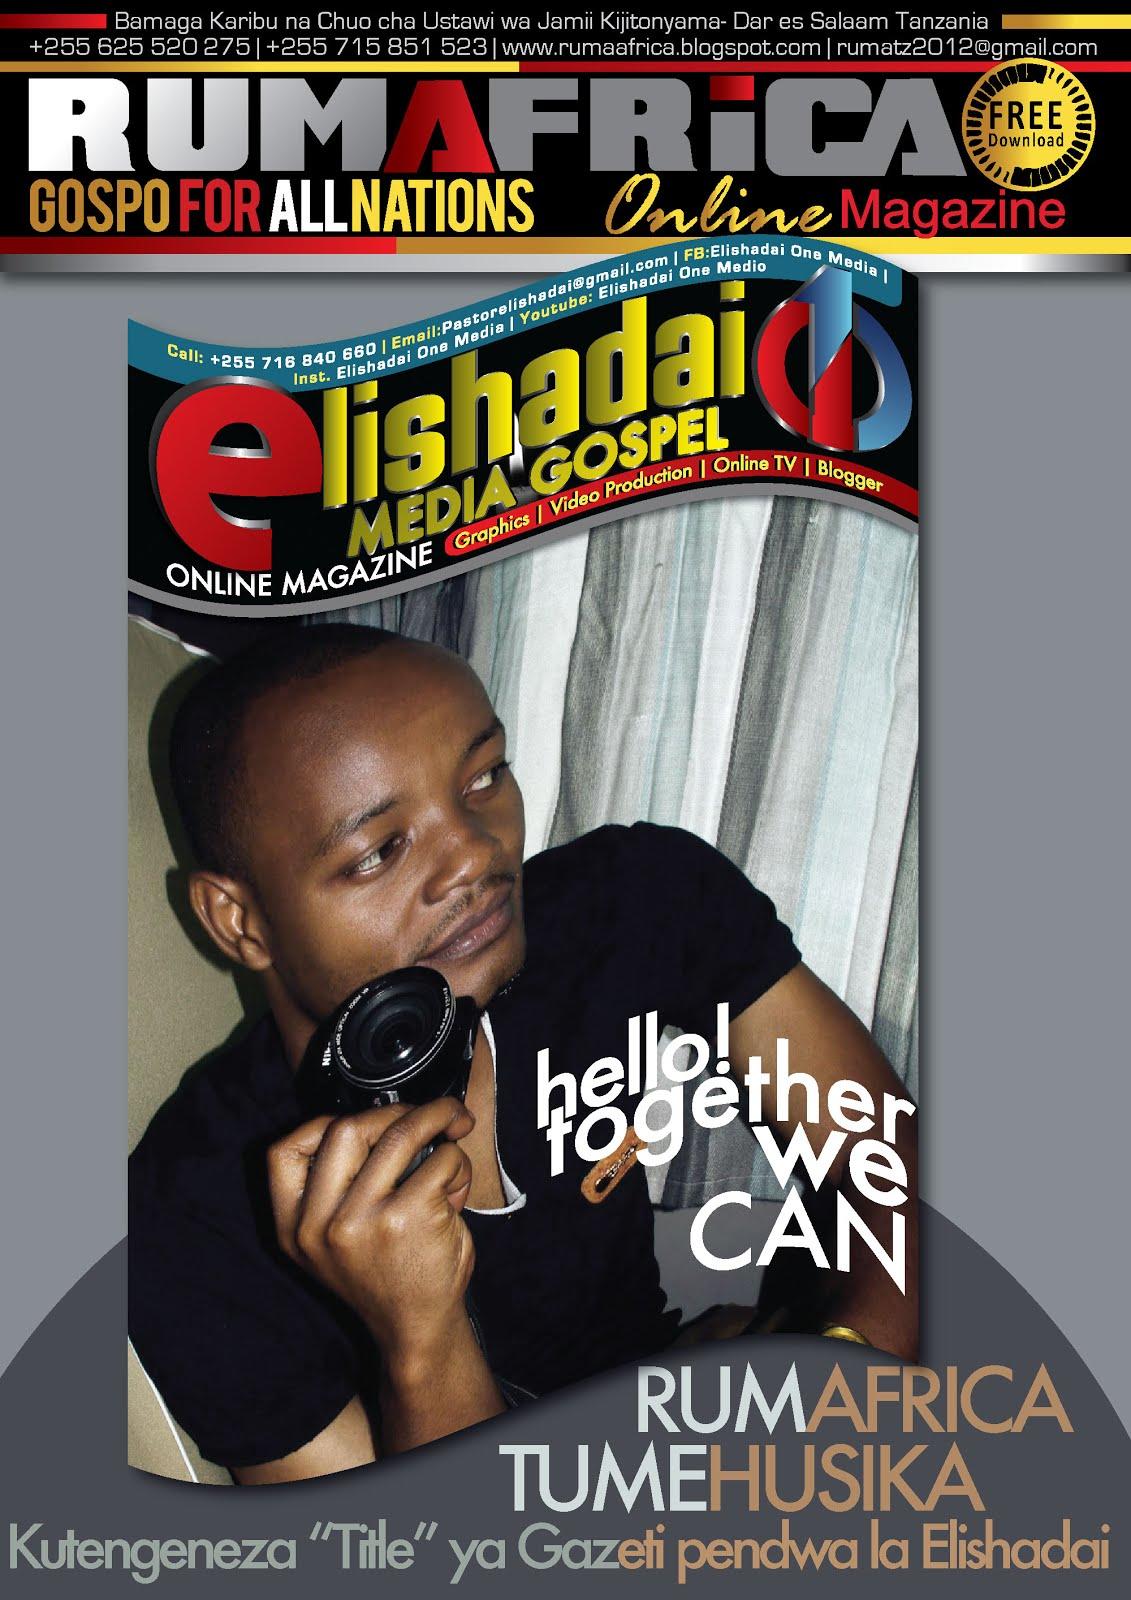 ELISHADAI Magazine